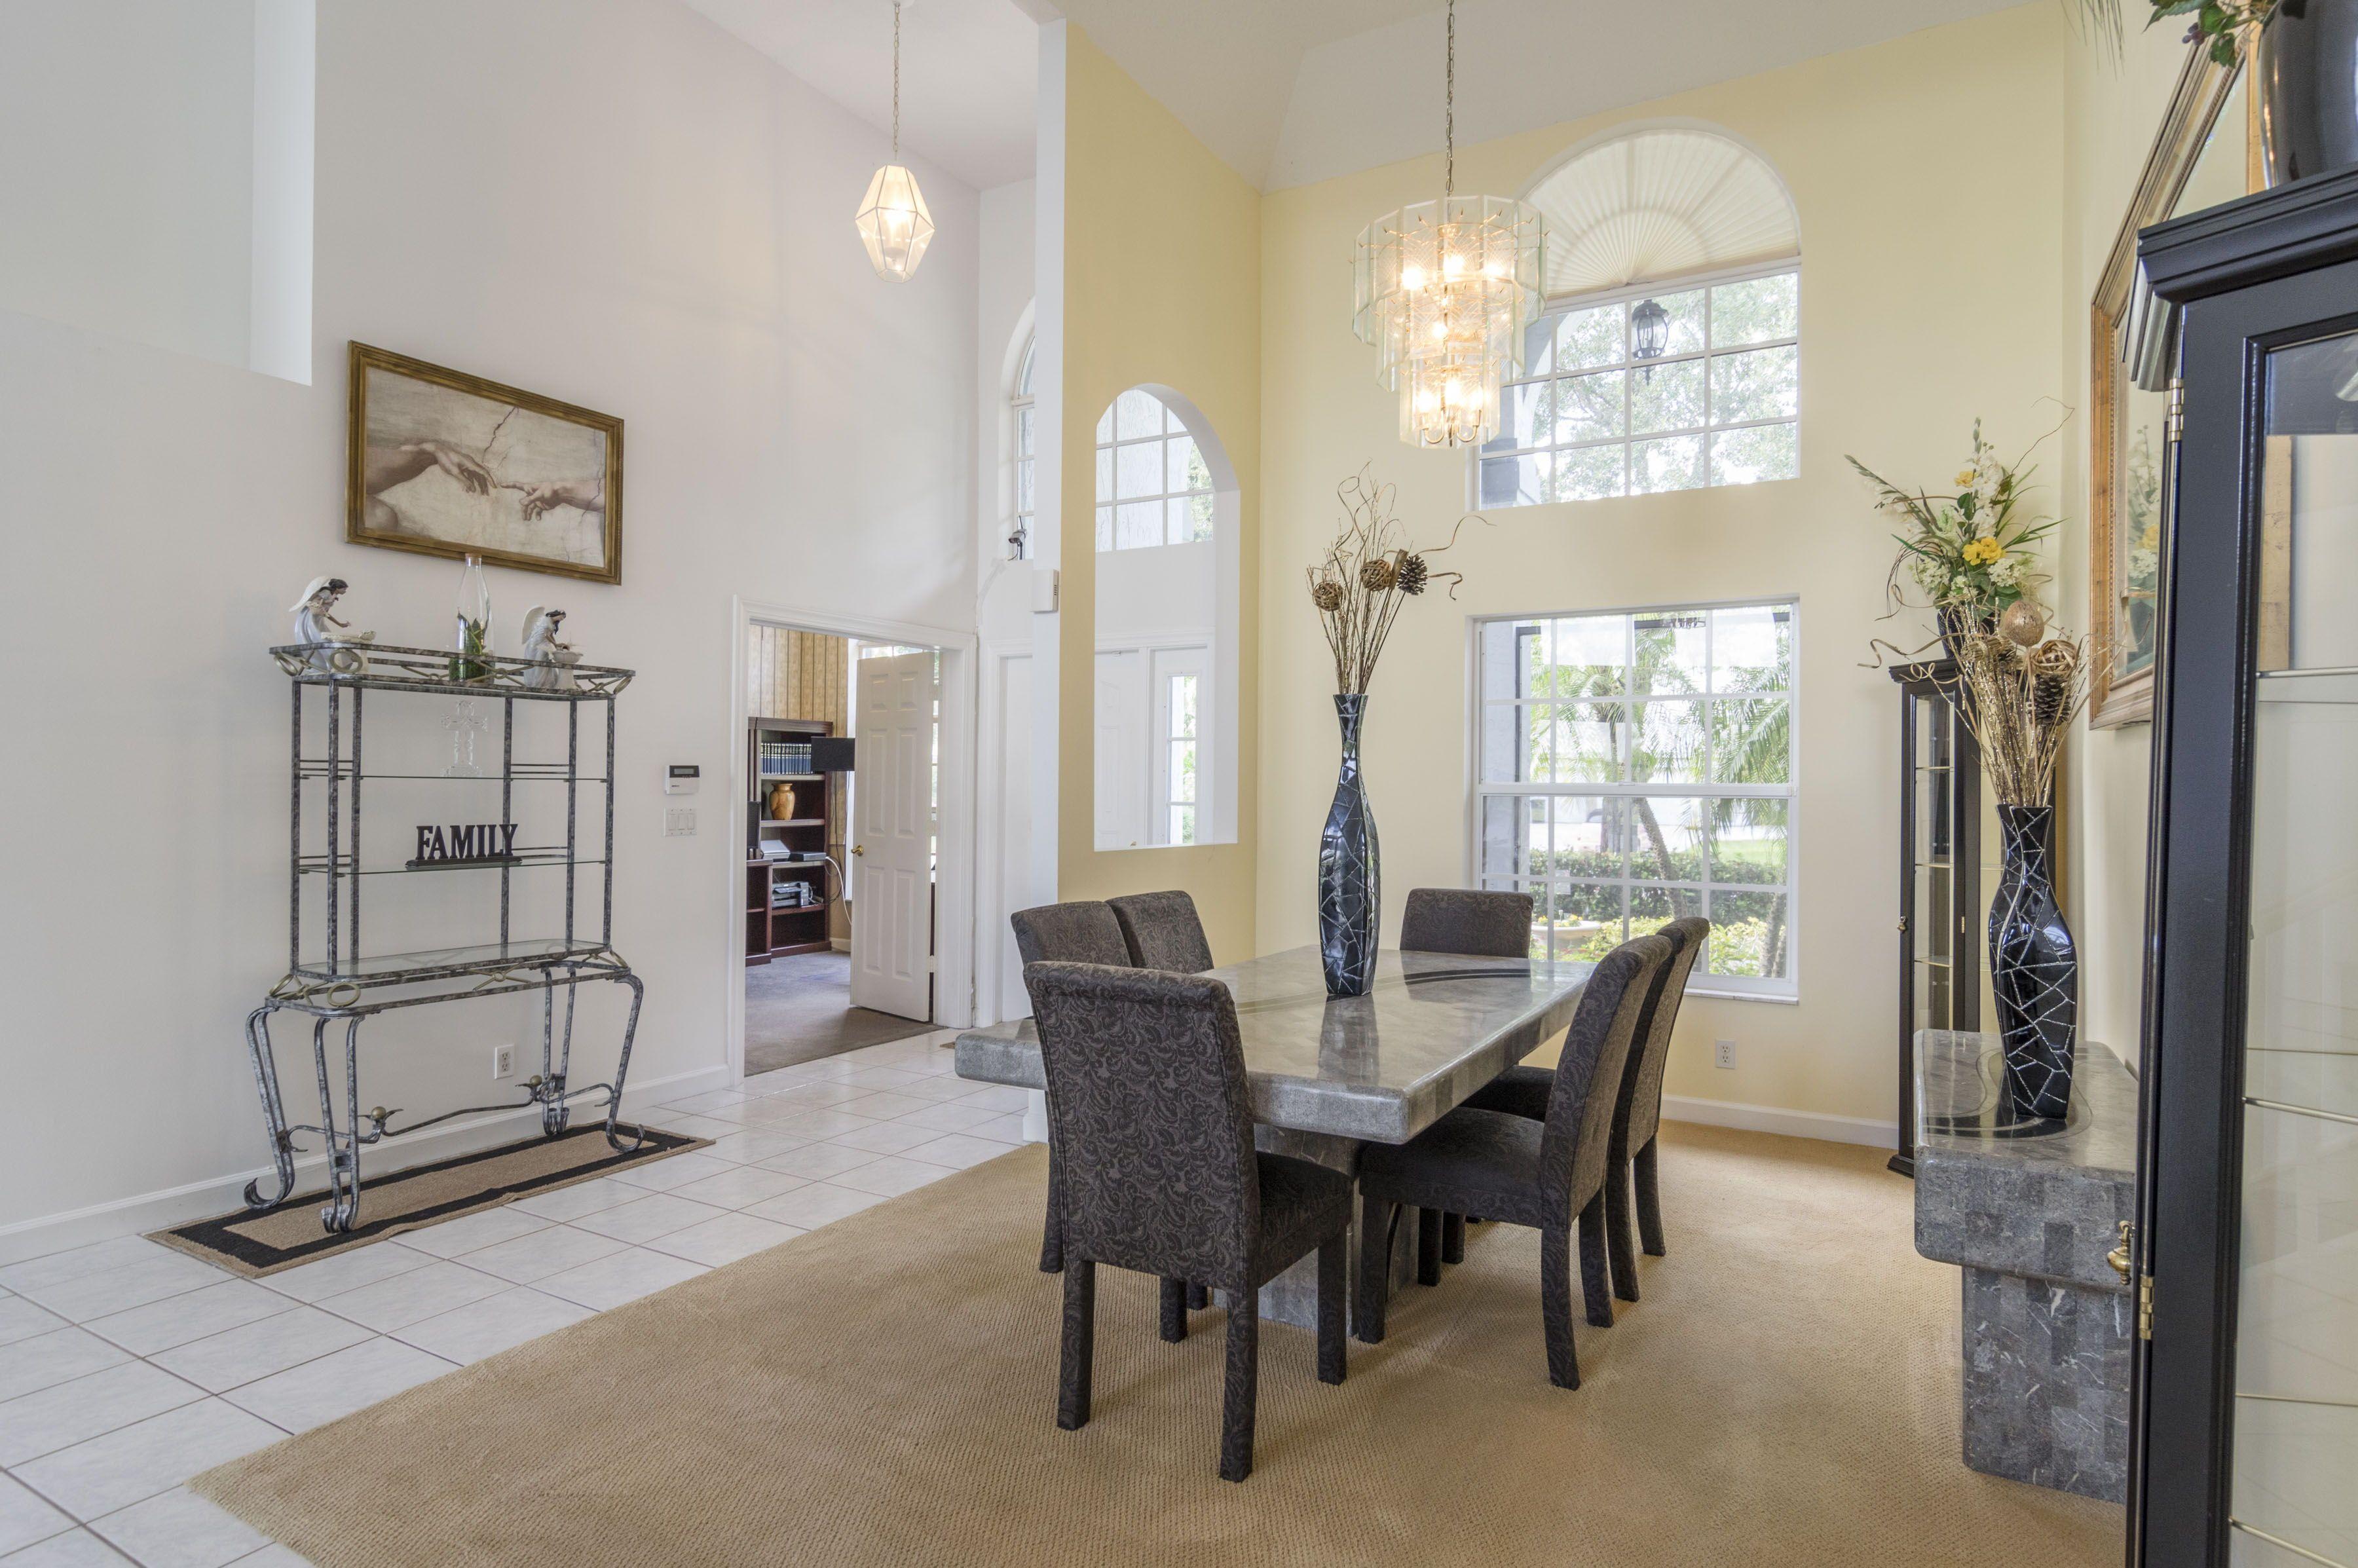 b0f11349476136cab8815c0503bc326b - Rooms For Rent Palm Beach Gardens Fl